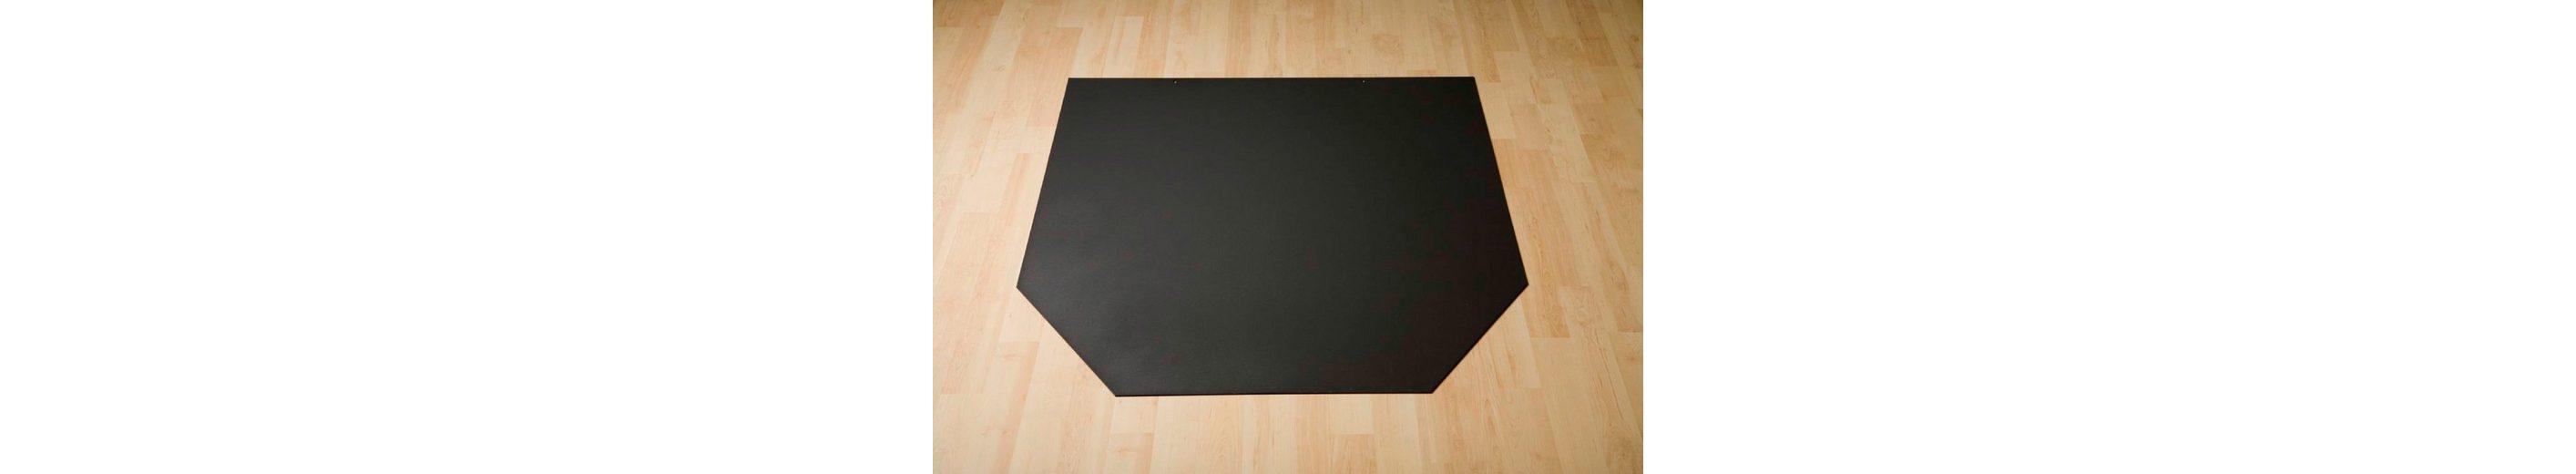 Stahlbodenplatte »Sechseck«, 100 x 86 cm, grau, zum Funkenschutz